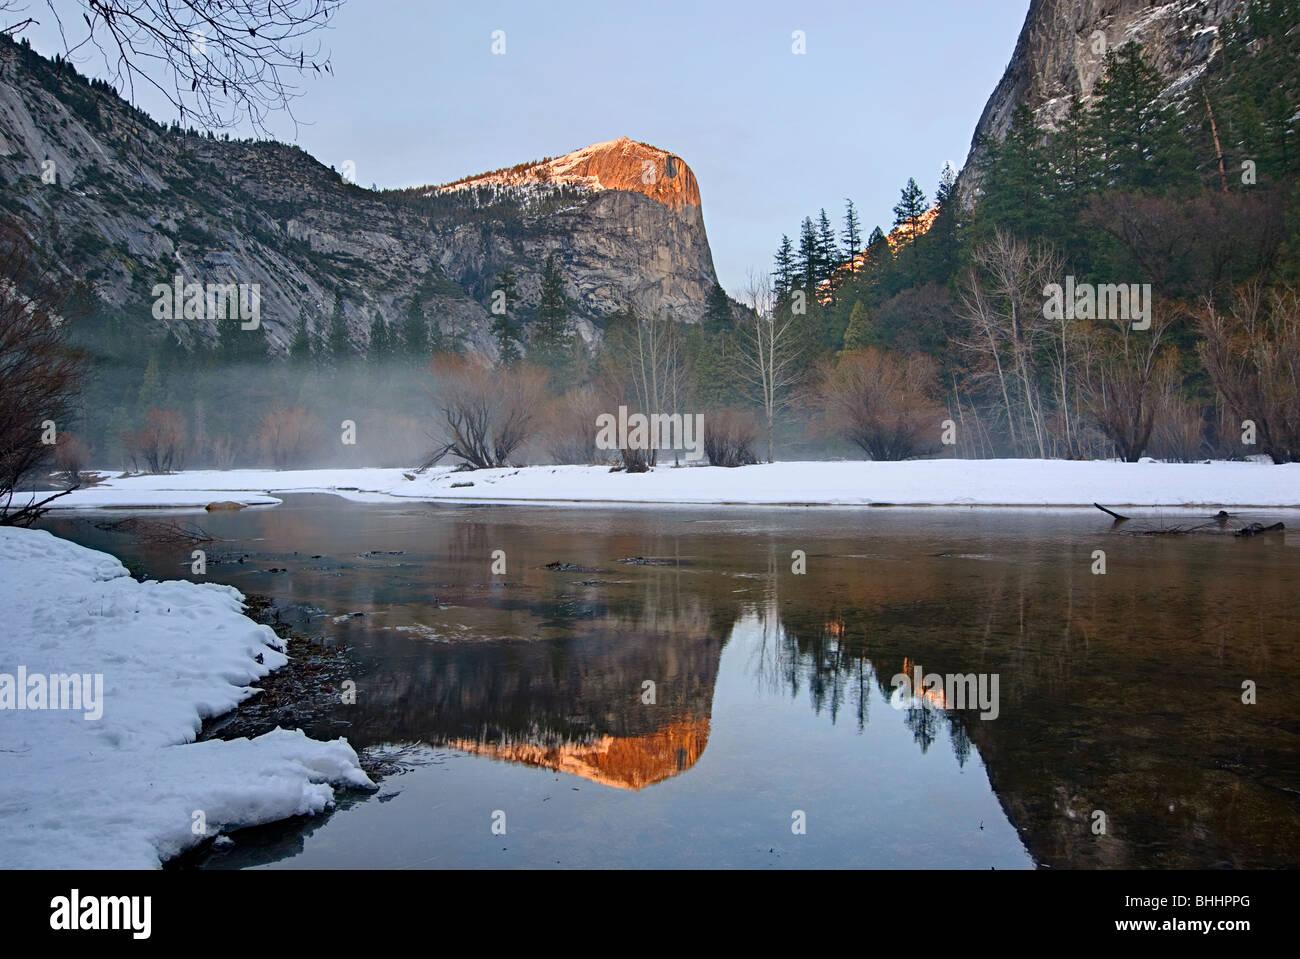 Damatic winter view of Mirror Lake in Yosemite National Park. - Stock Image